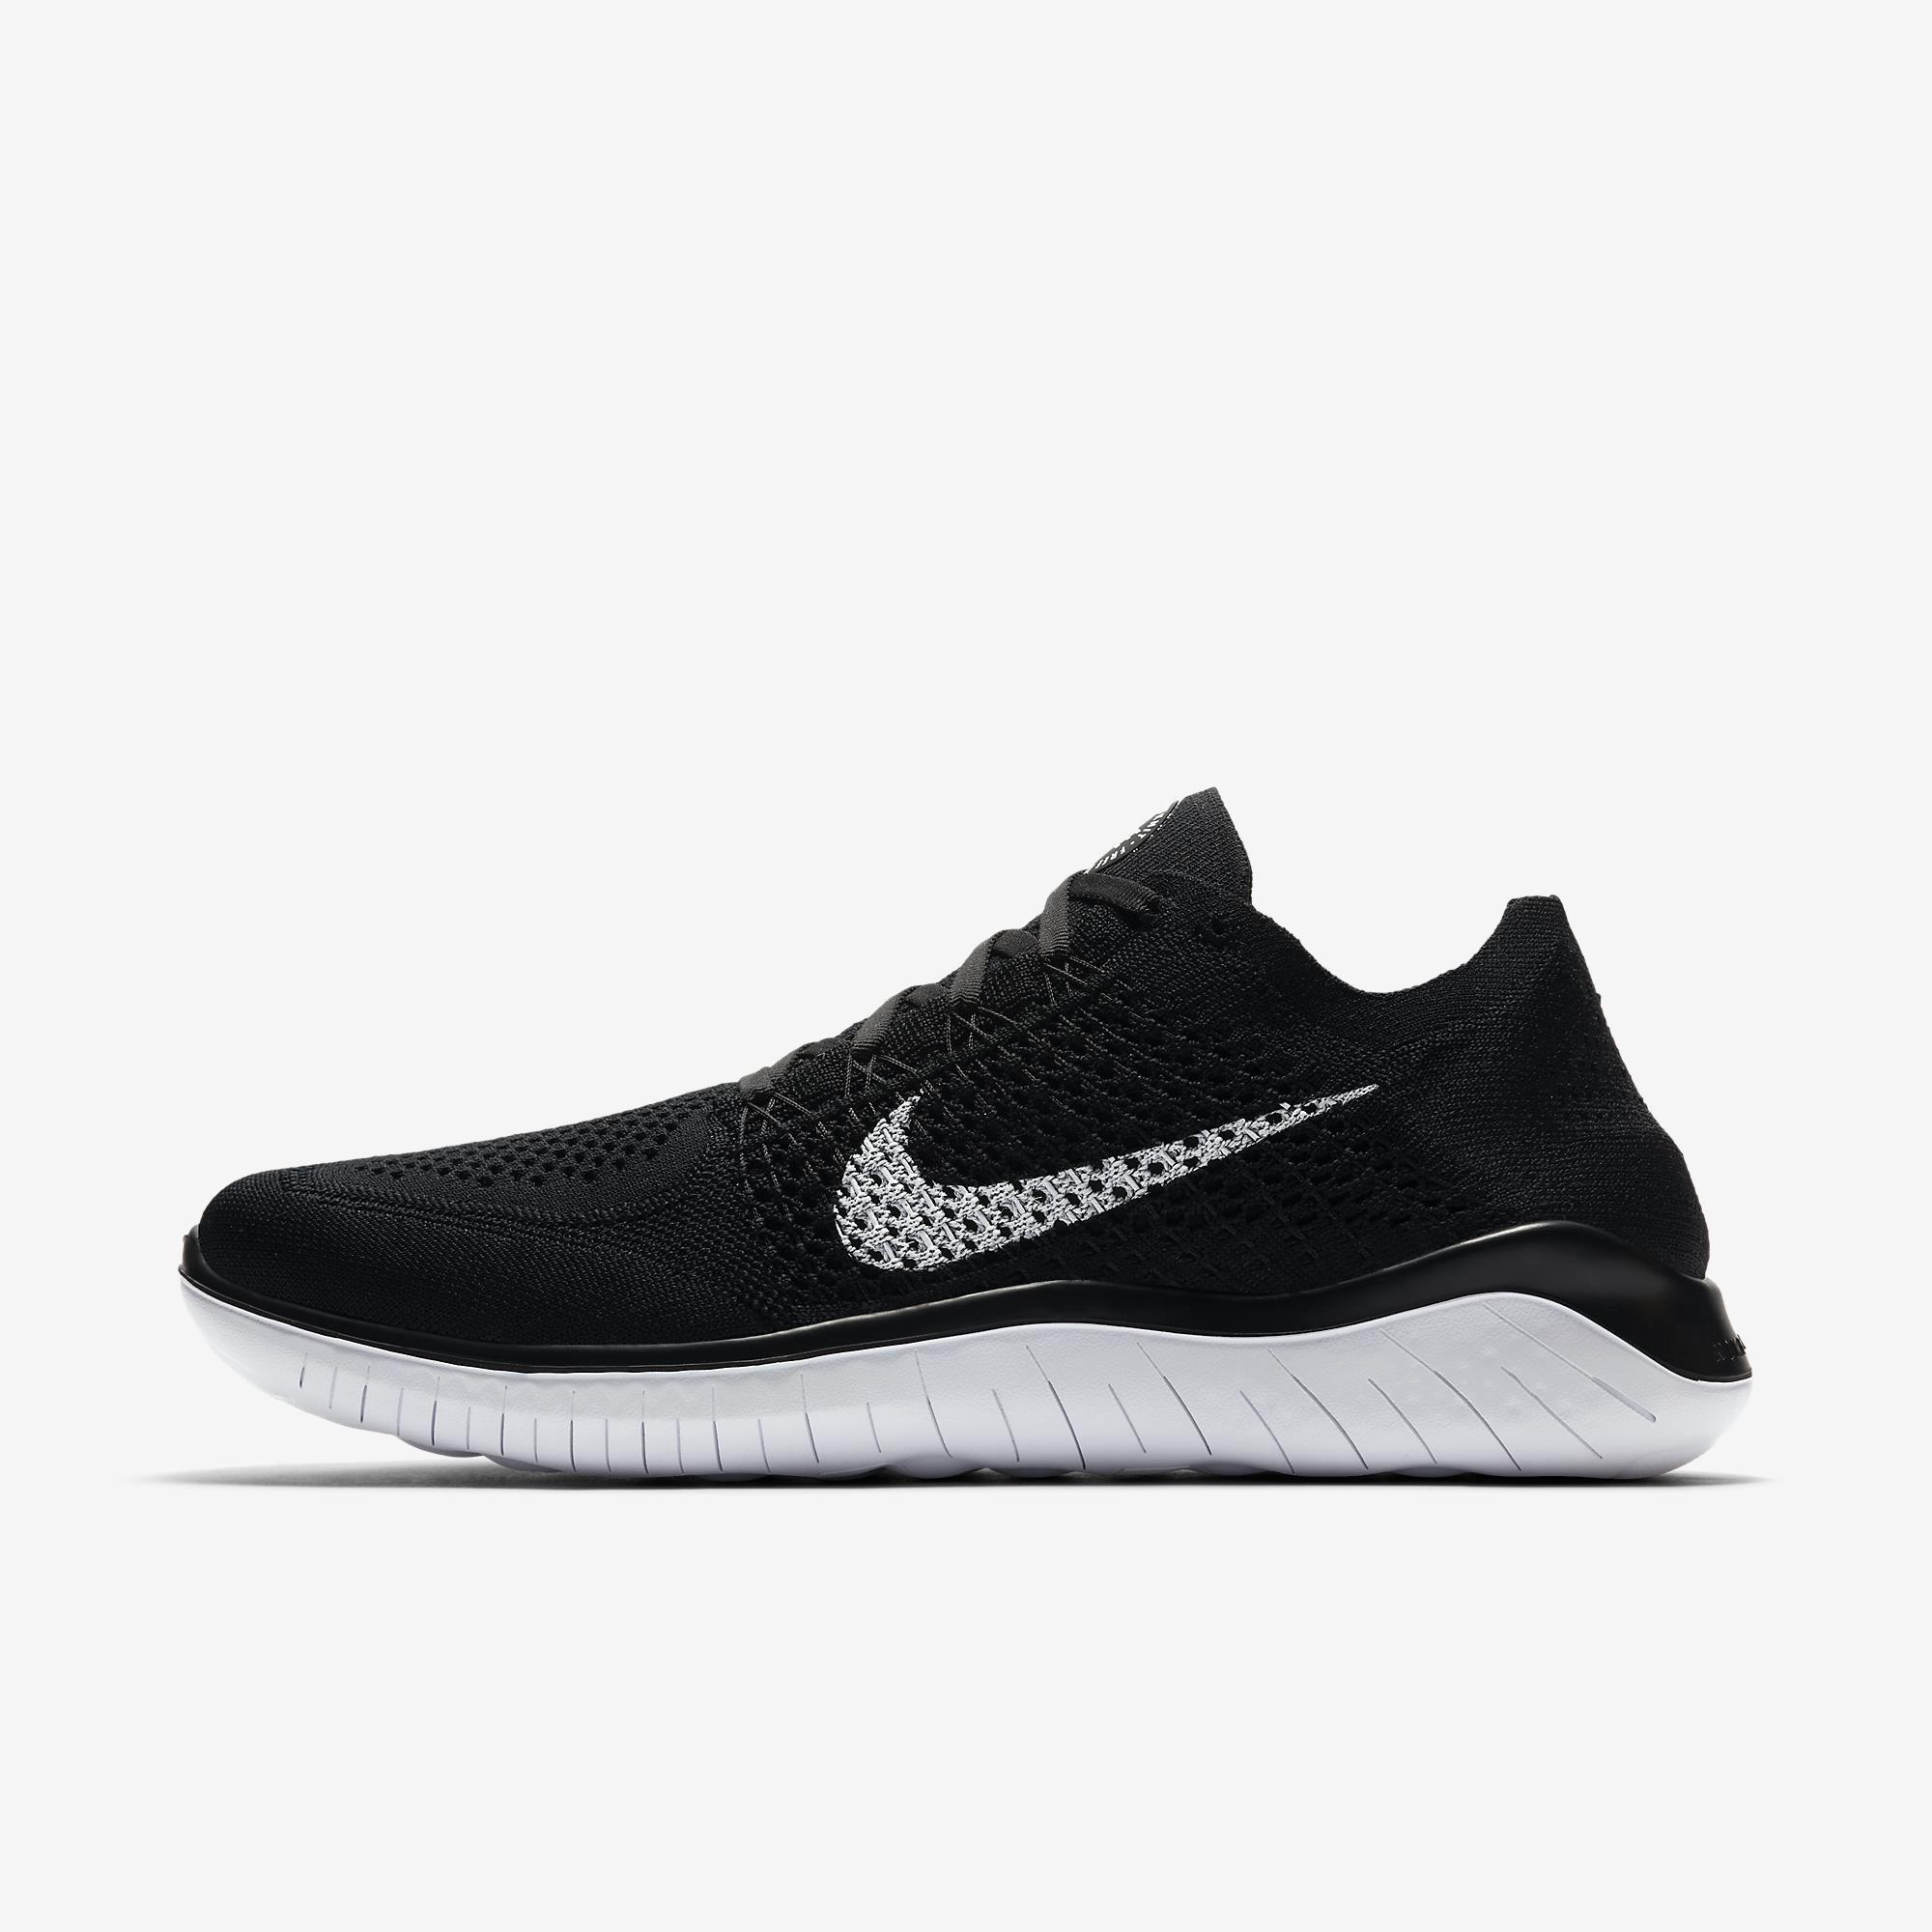 267ac7291f1 Tênis Nike Free RN Flyknit 2018 Masculino